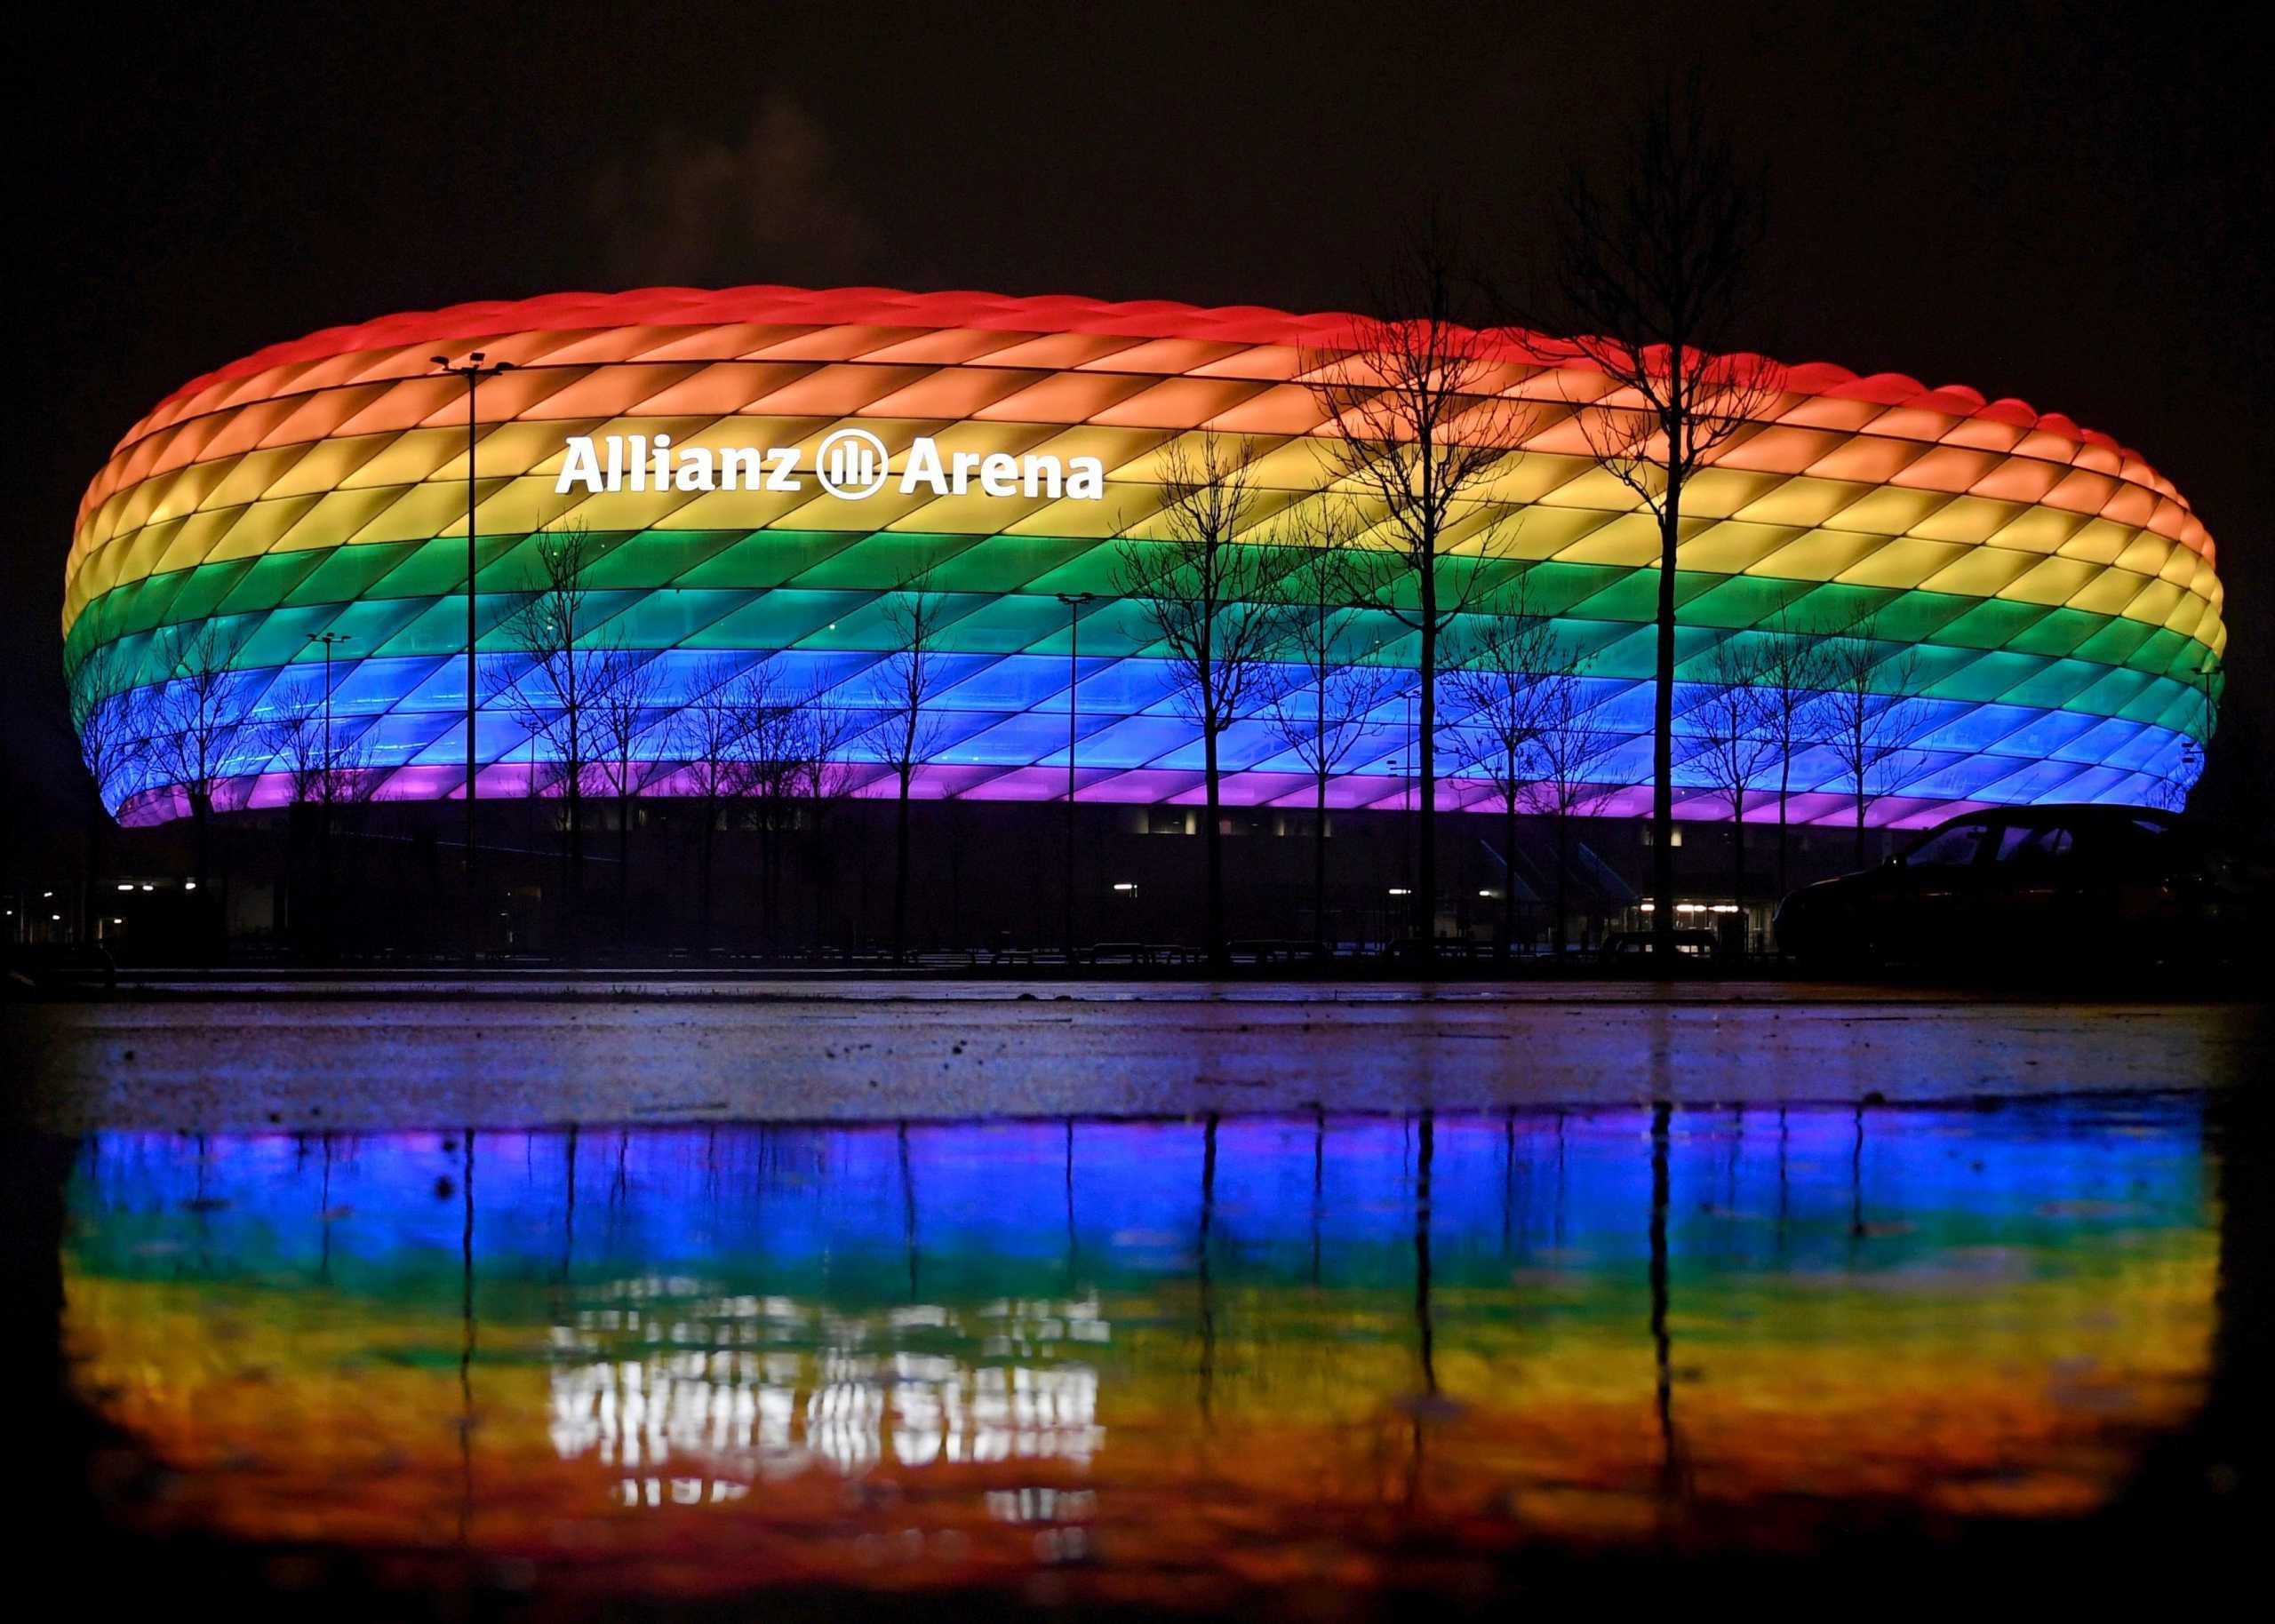 Euro 2020: Άρνηση της UEFA για φωτισμό της «Αλιάνζ Αρίνα» στα χρώματα του ουράνιου τόξου